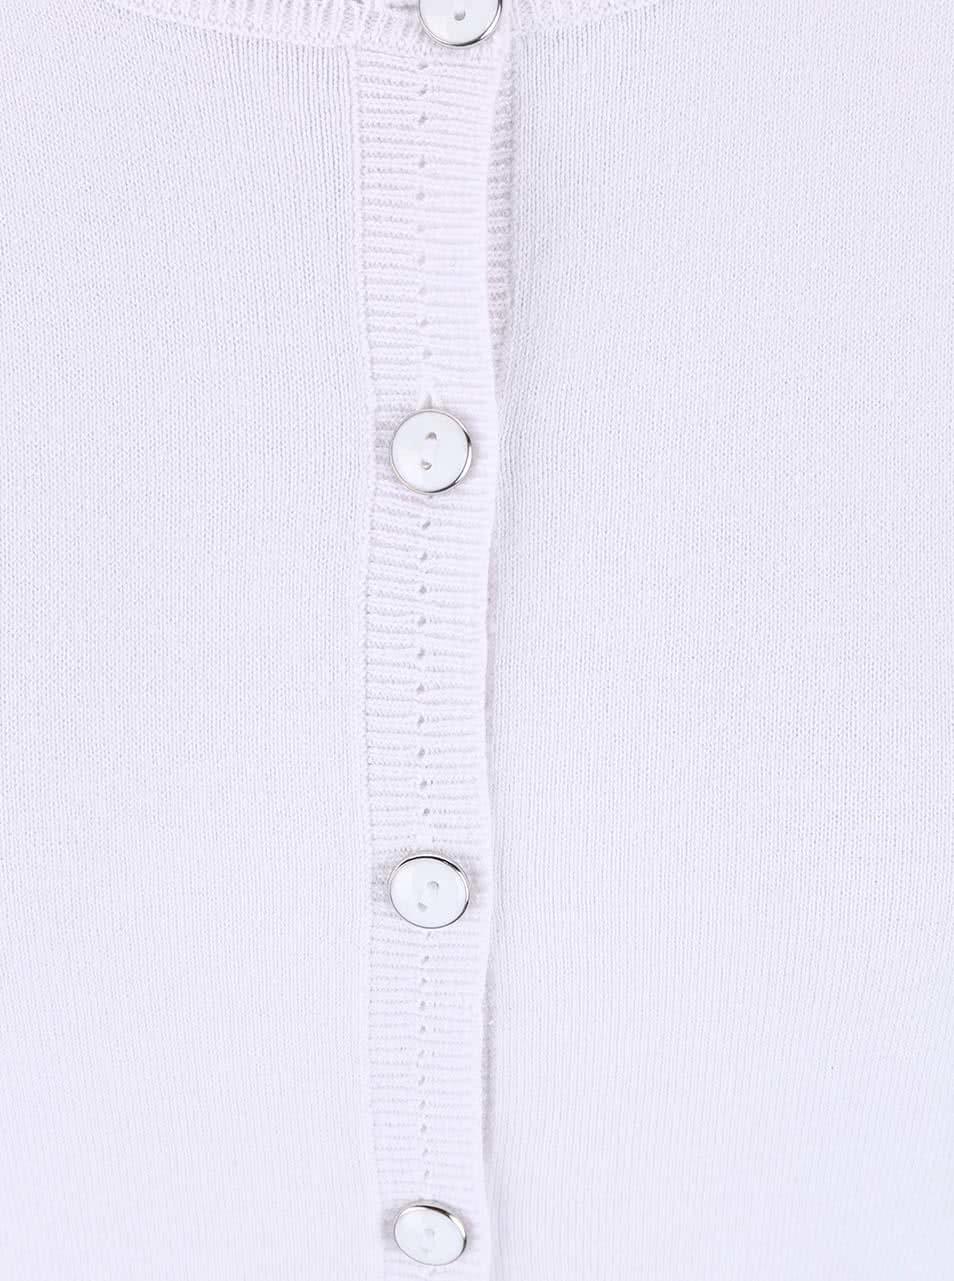 a8931f6a0d57 Biely sveter na gombíky Dorothy Perkins ...